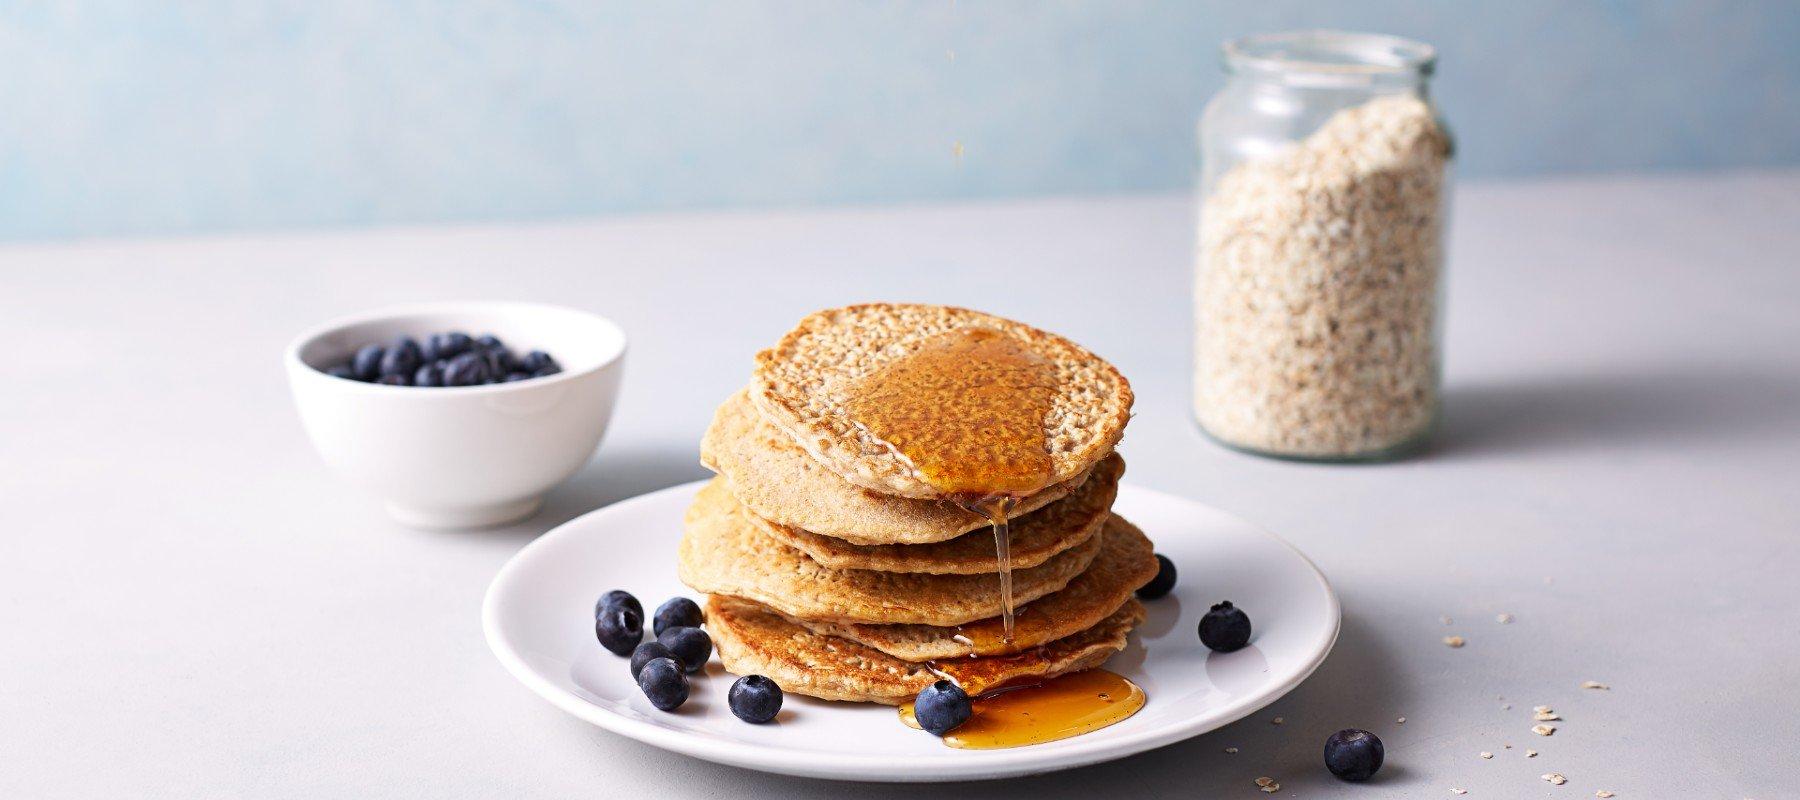 4-Ingredient Foolproof Banana Protein Pancakes (& 5 More Protein Pancake Recipes)